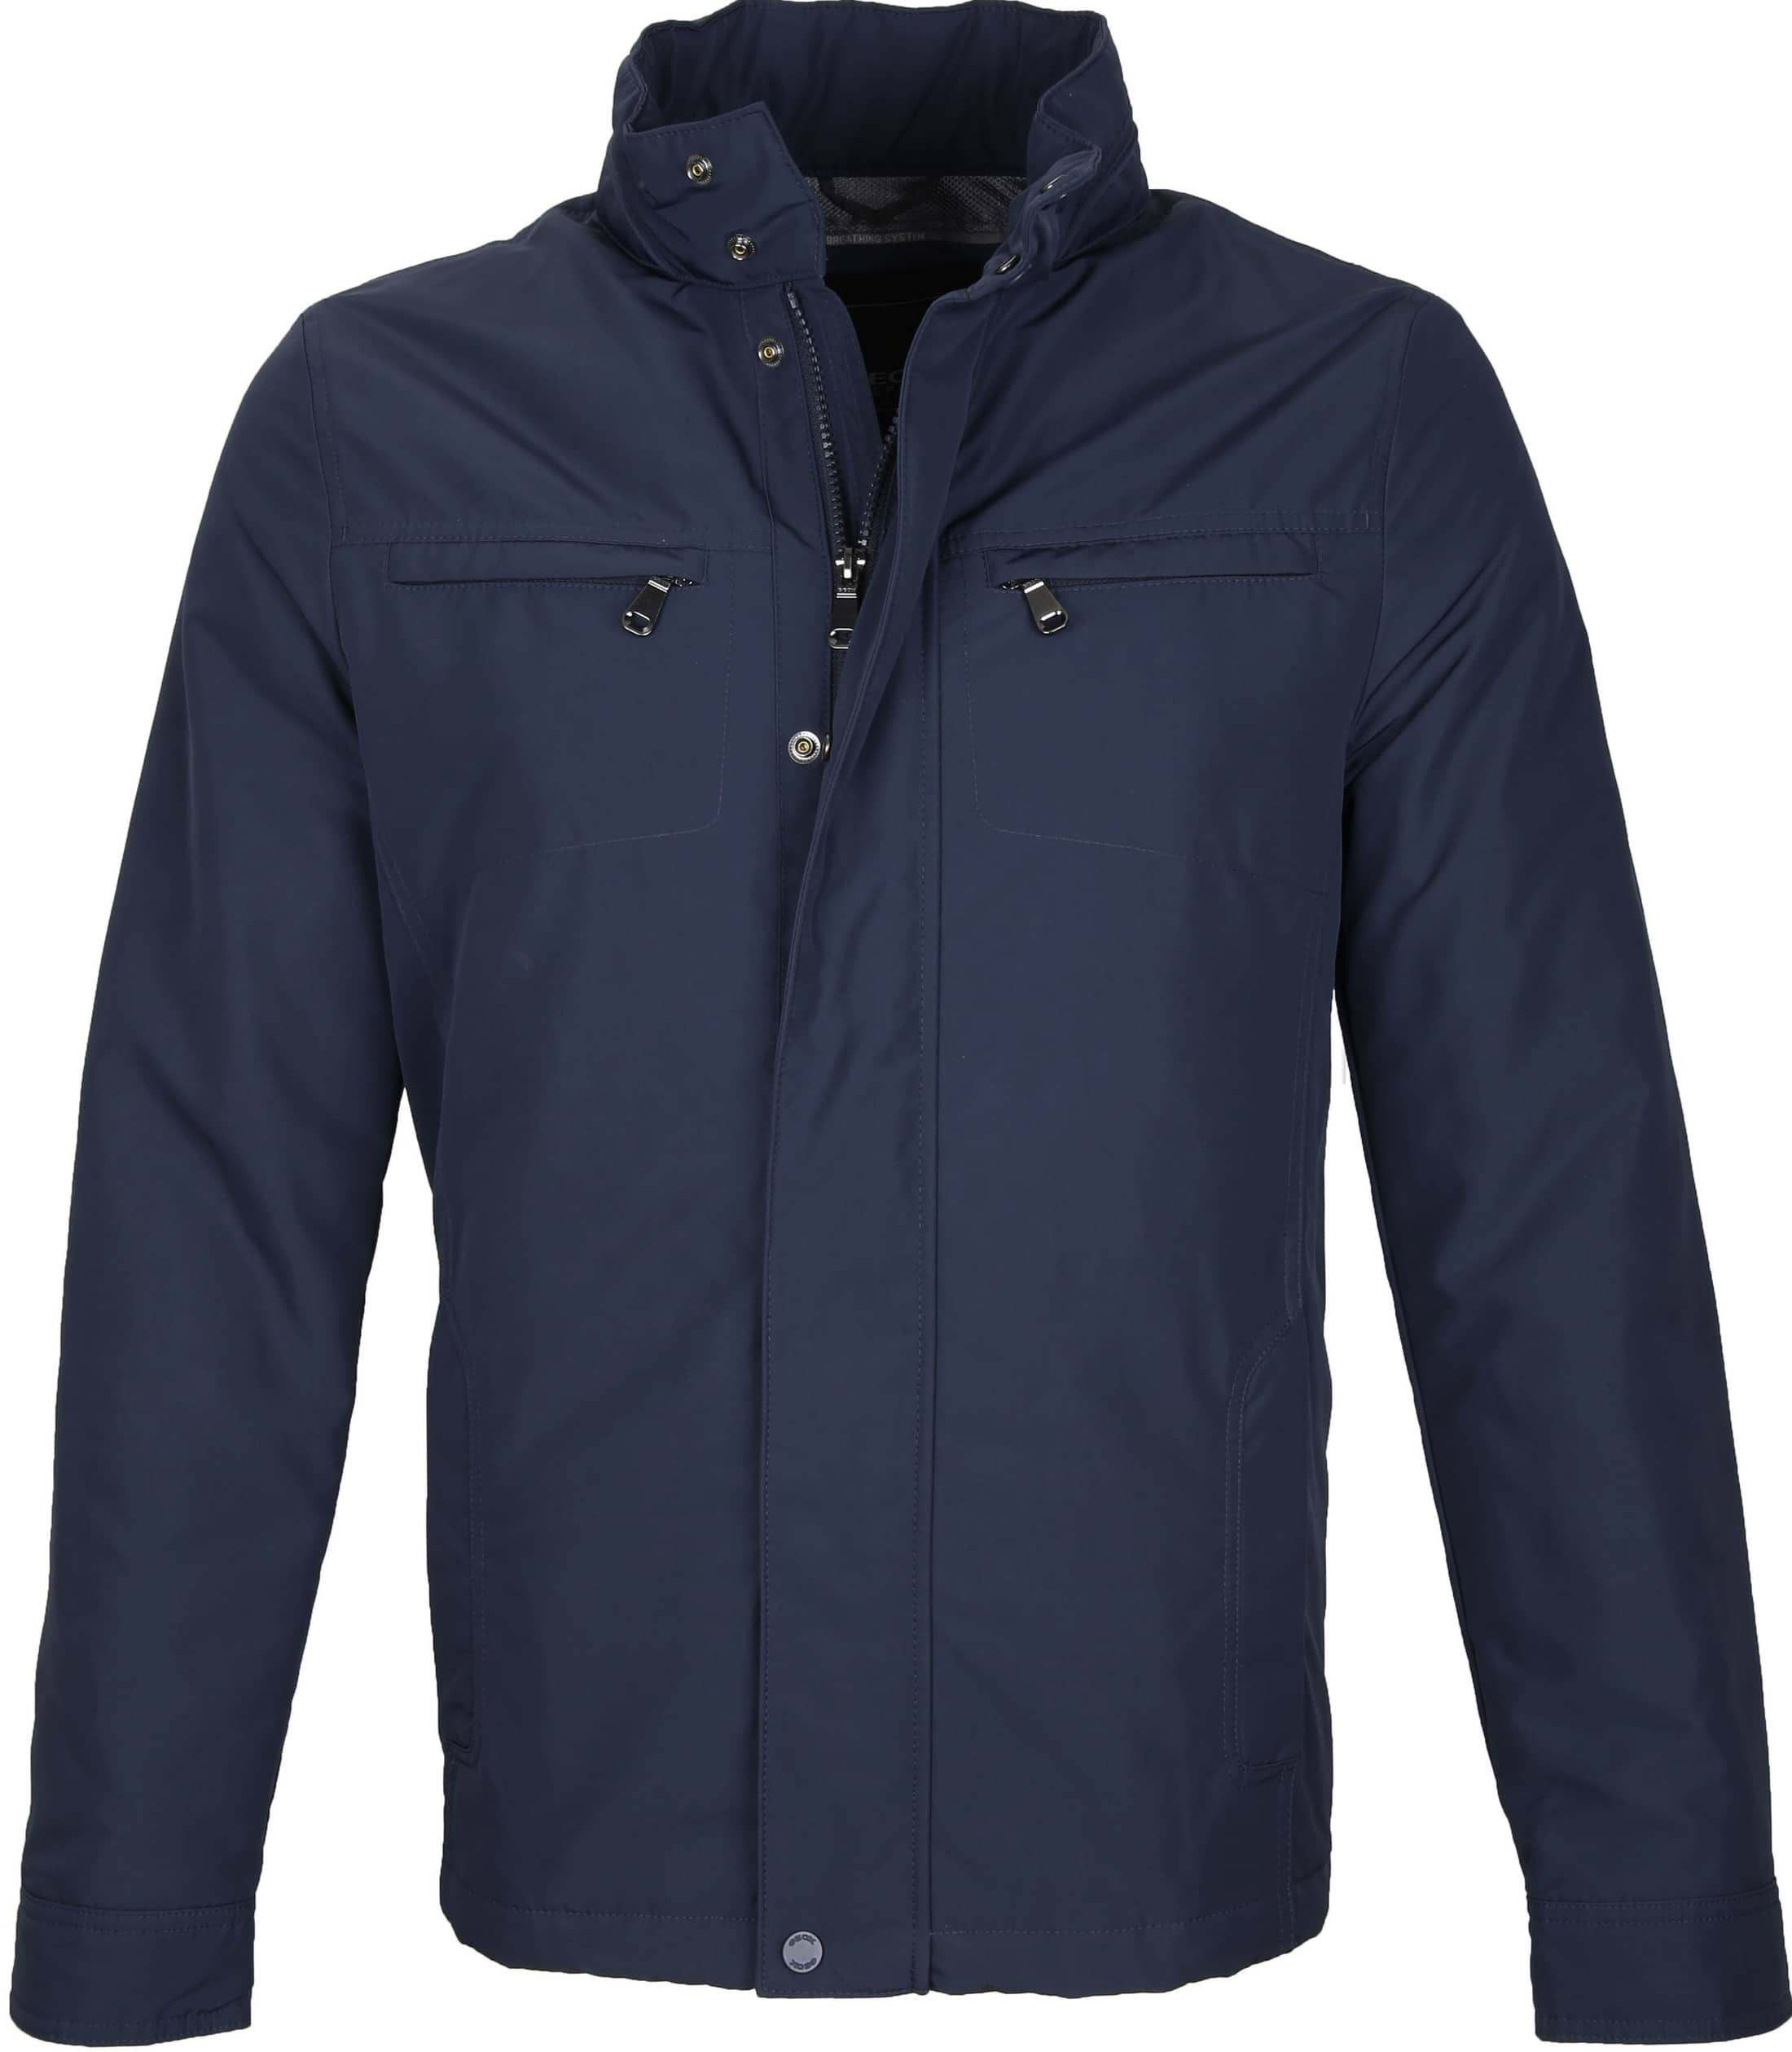 on sale 66a82 83938 Geox Vincit Jacke Dunkelblau M8420G - T2419 online kaufen ...